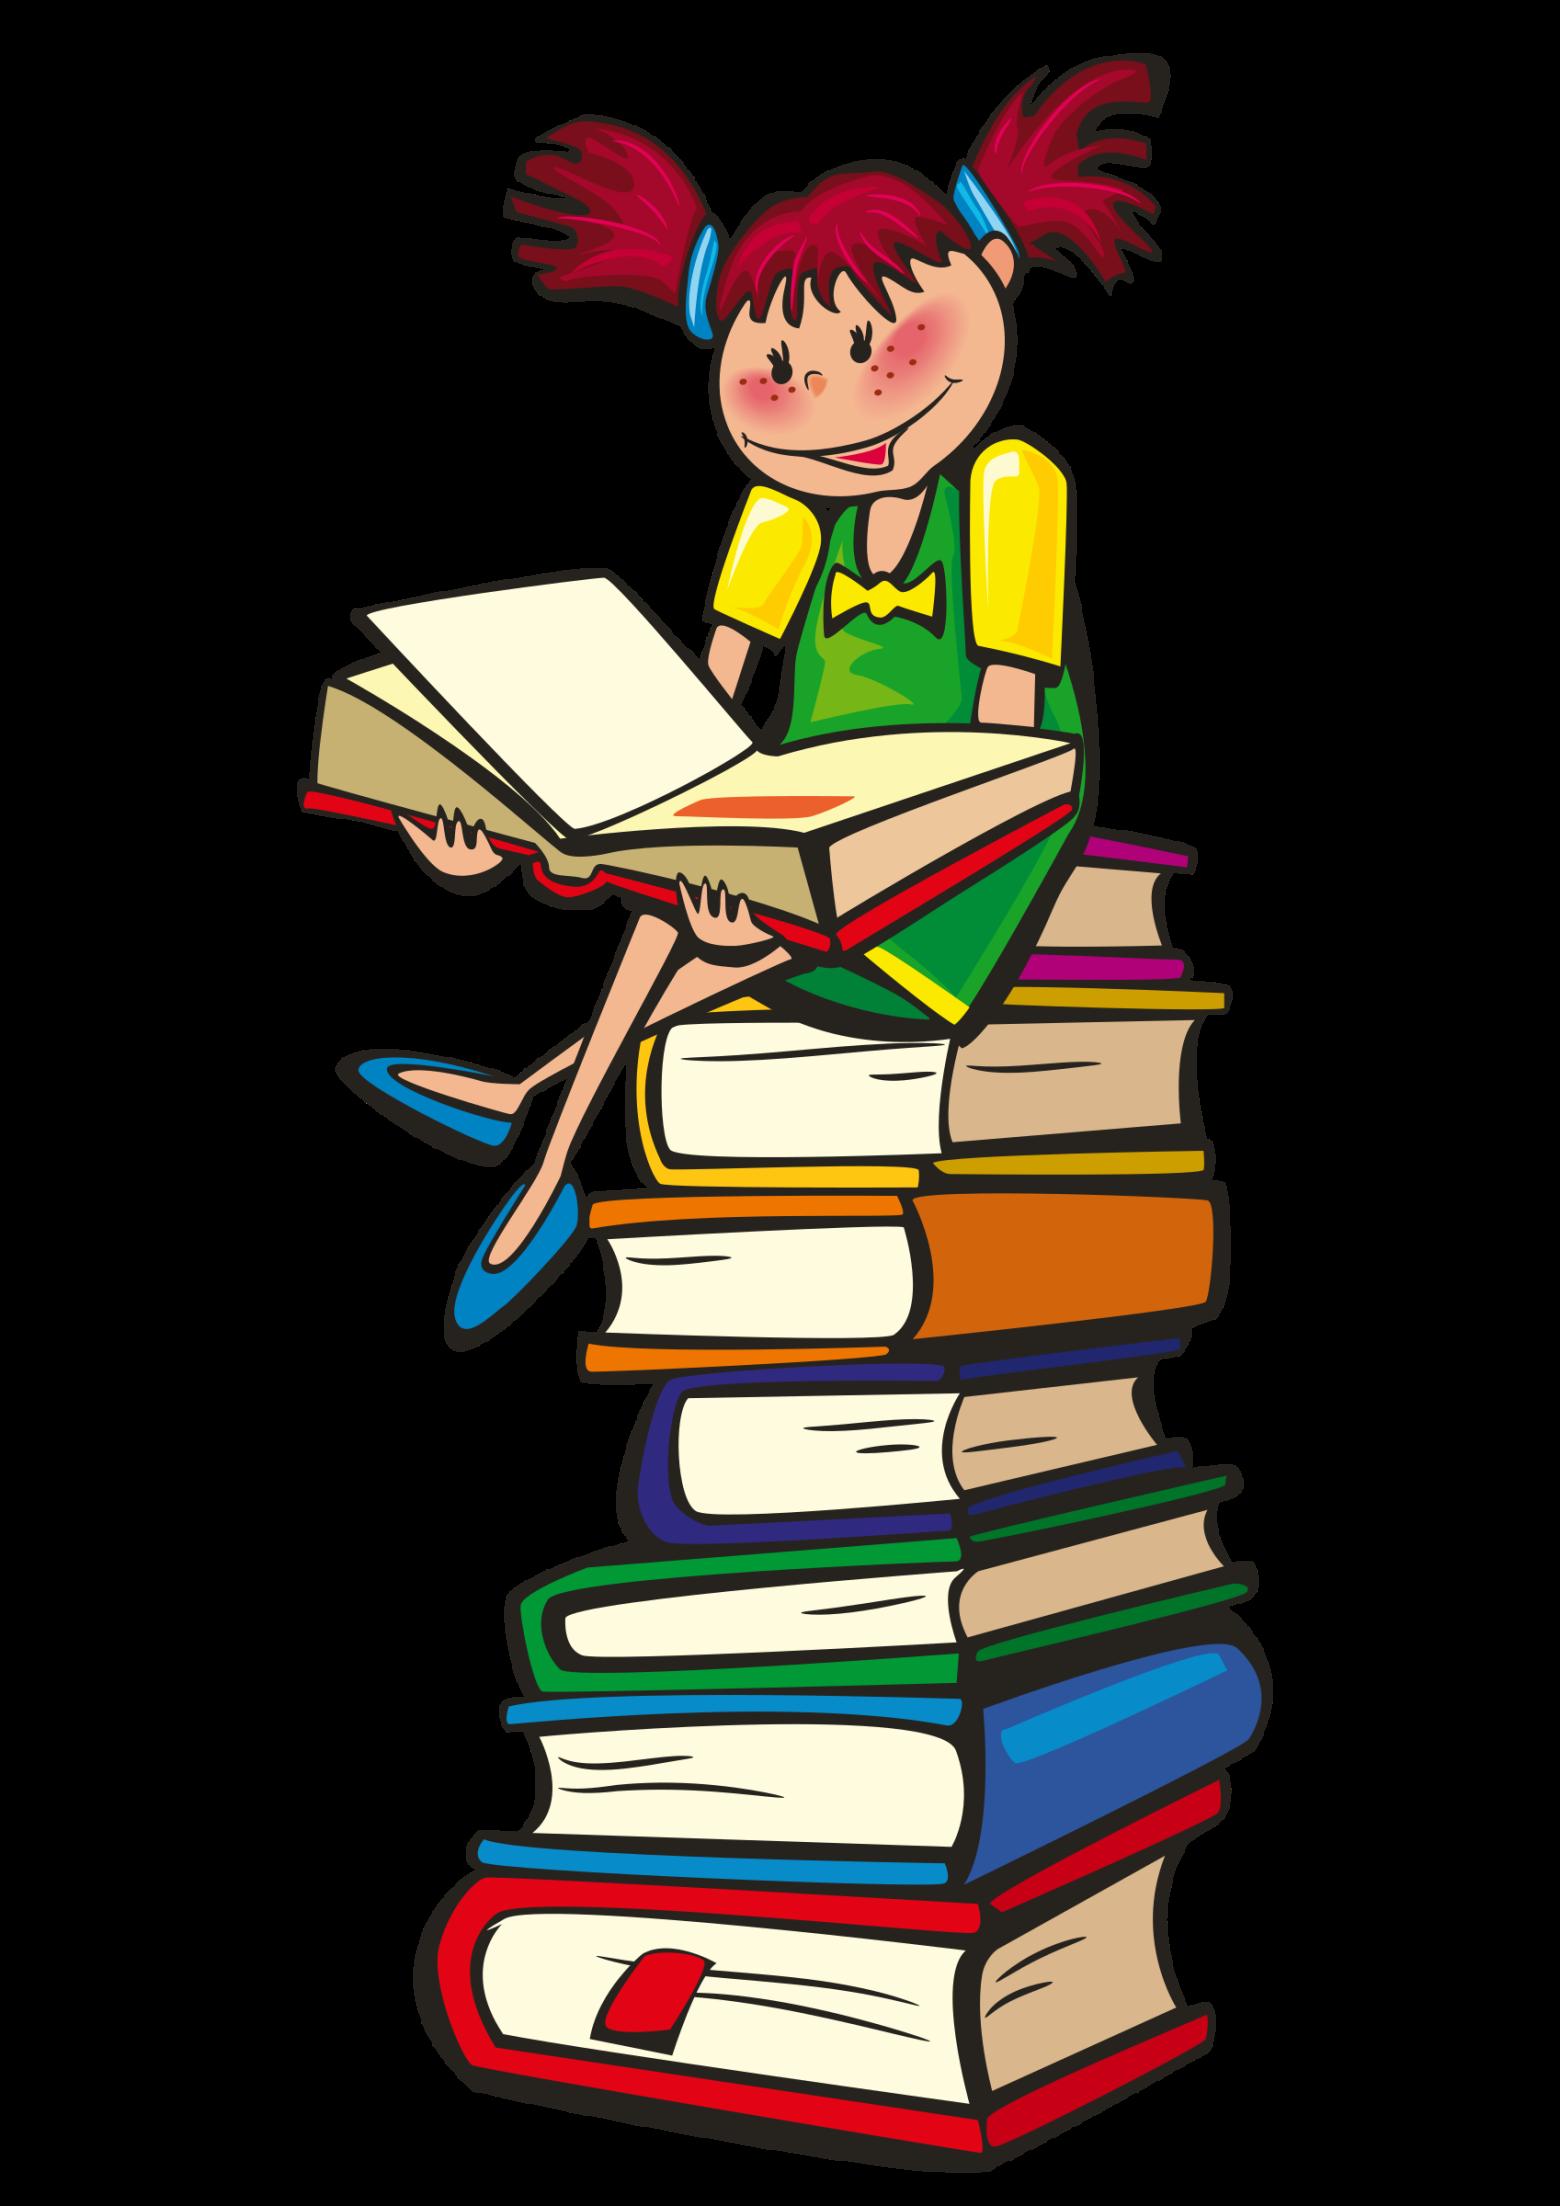 Devoirs ou le ons. Study clipart study timetable